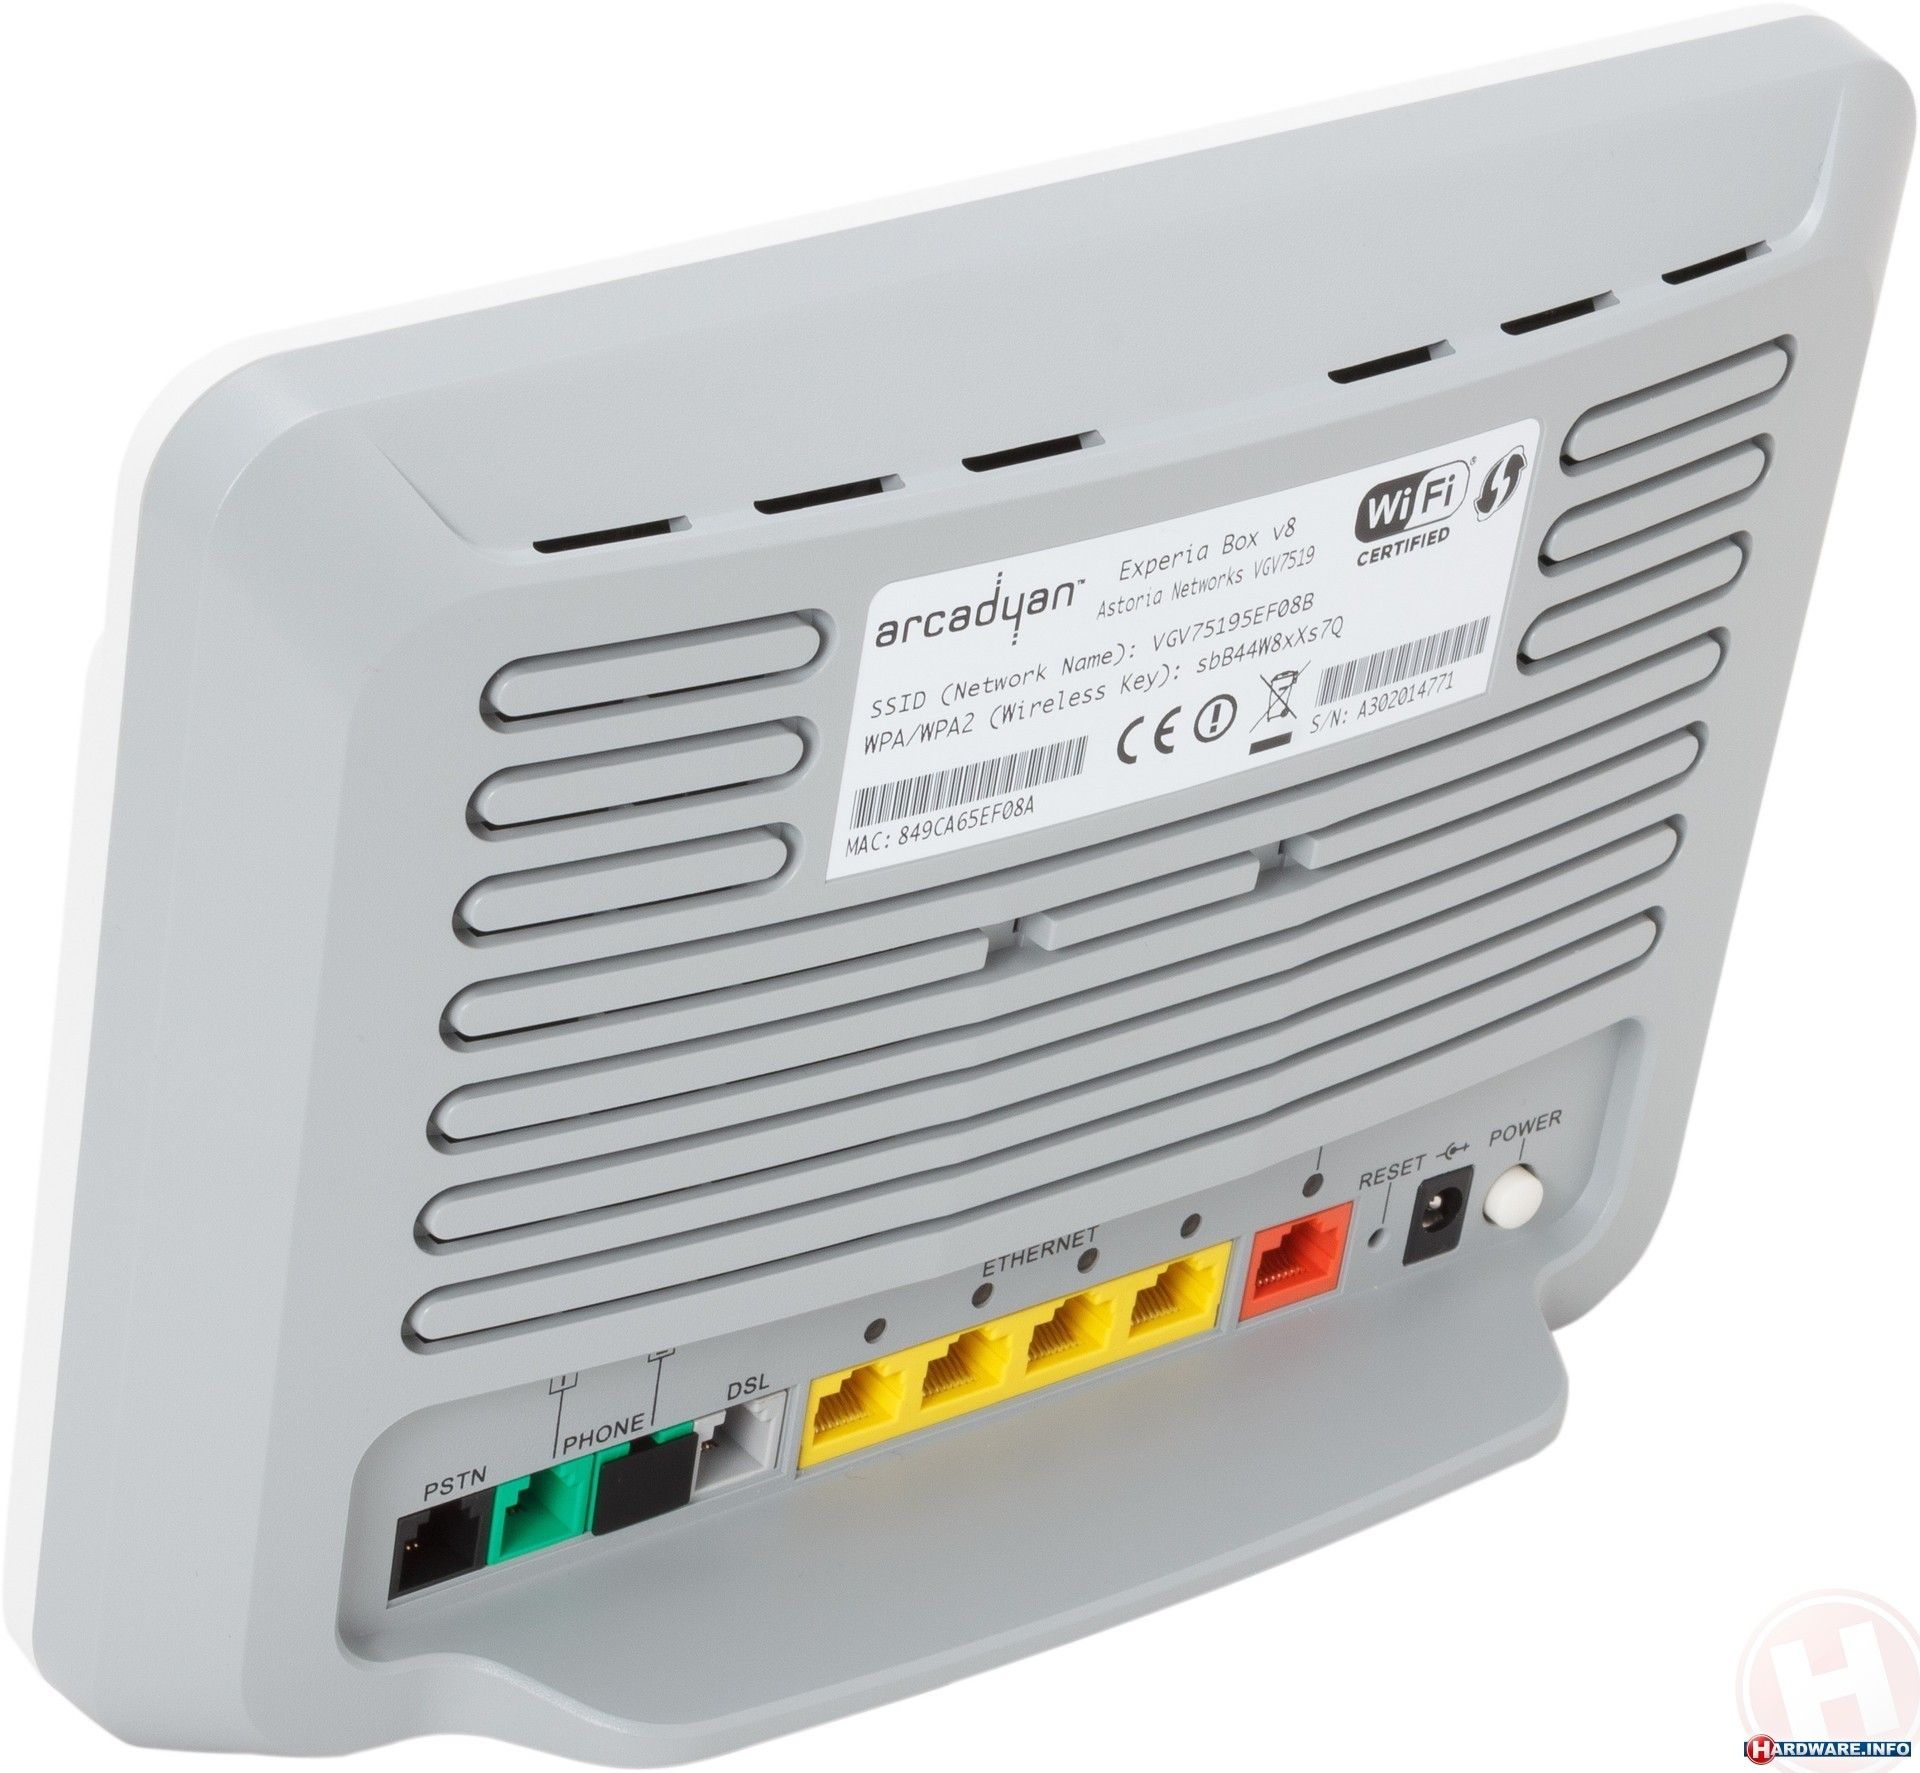 Wonderbaarlijk Arcadyan KPN Experia Box v8 router - Hardware Info IV-26